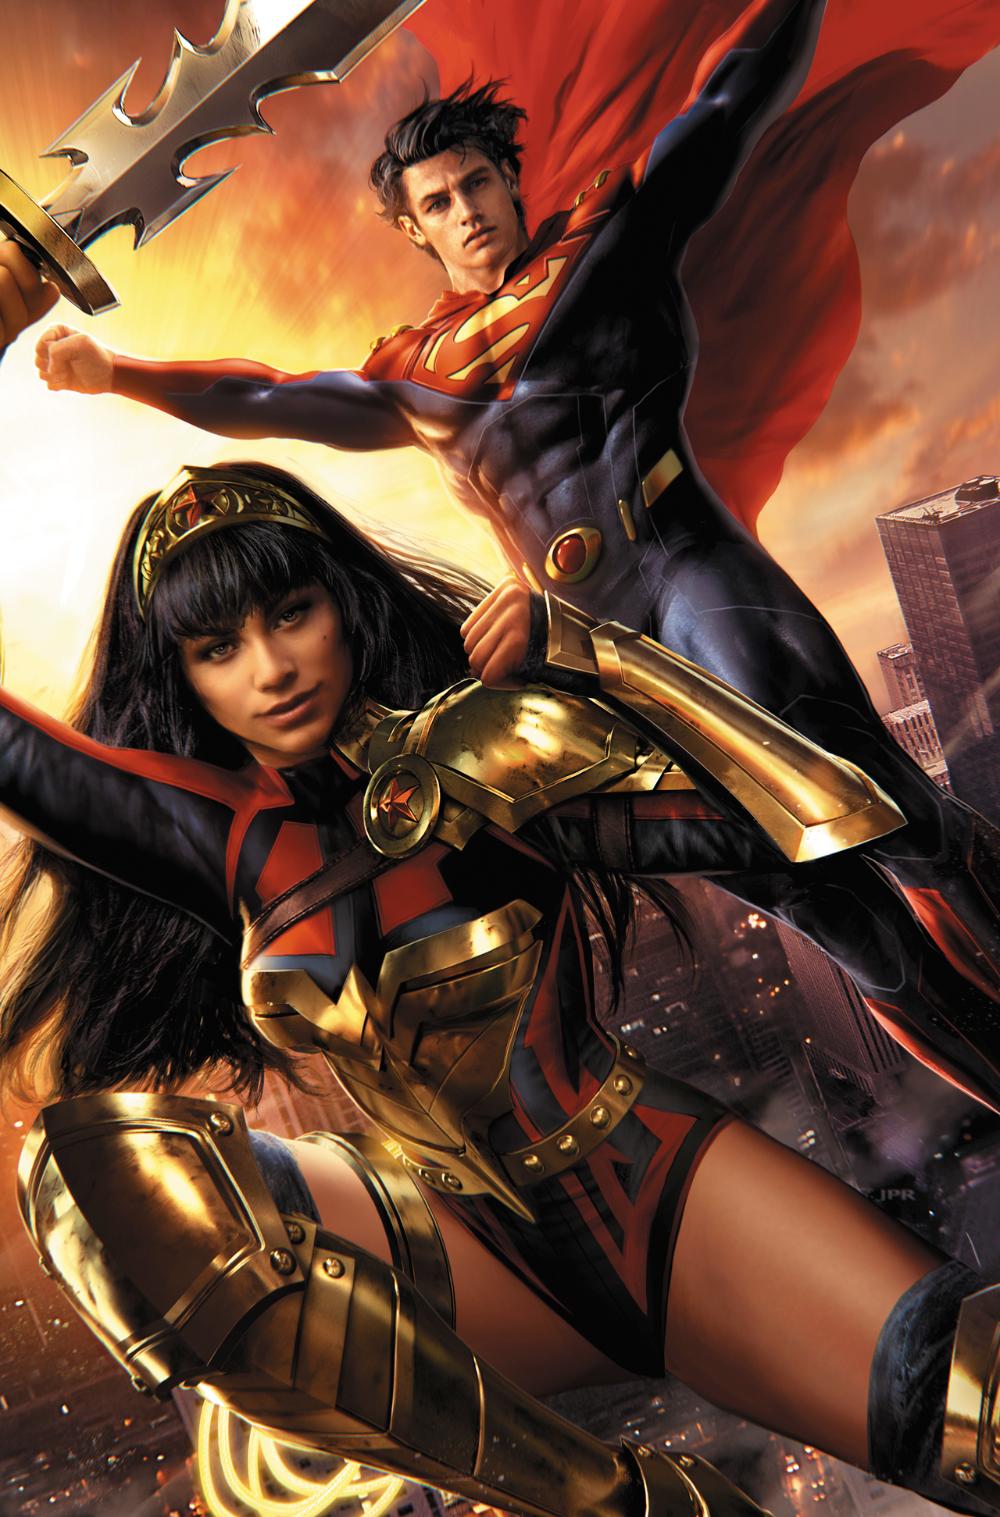 Dc Future State Superman And Justice League January 2021 Solicitations Superman Wonder Woman Dc Comics Artwork Dc Comics Superheroes